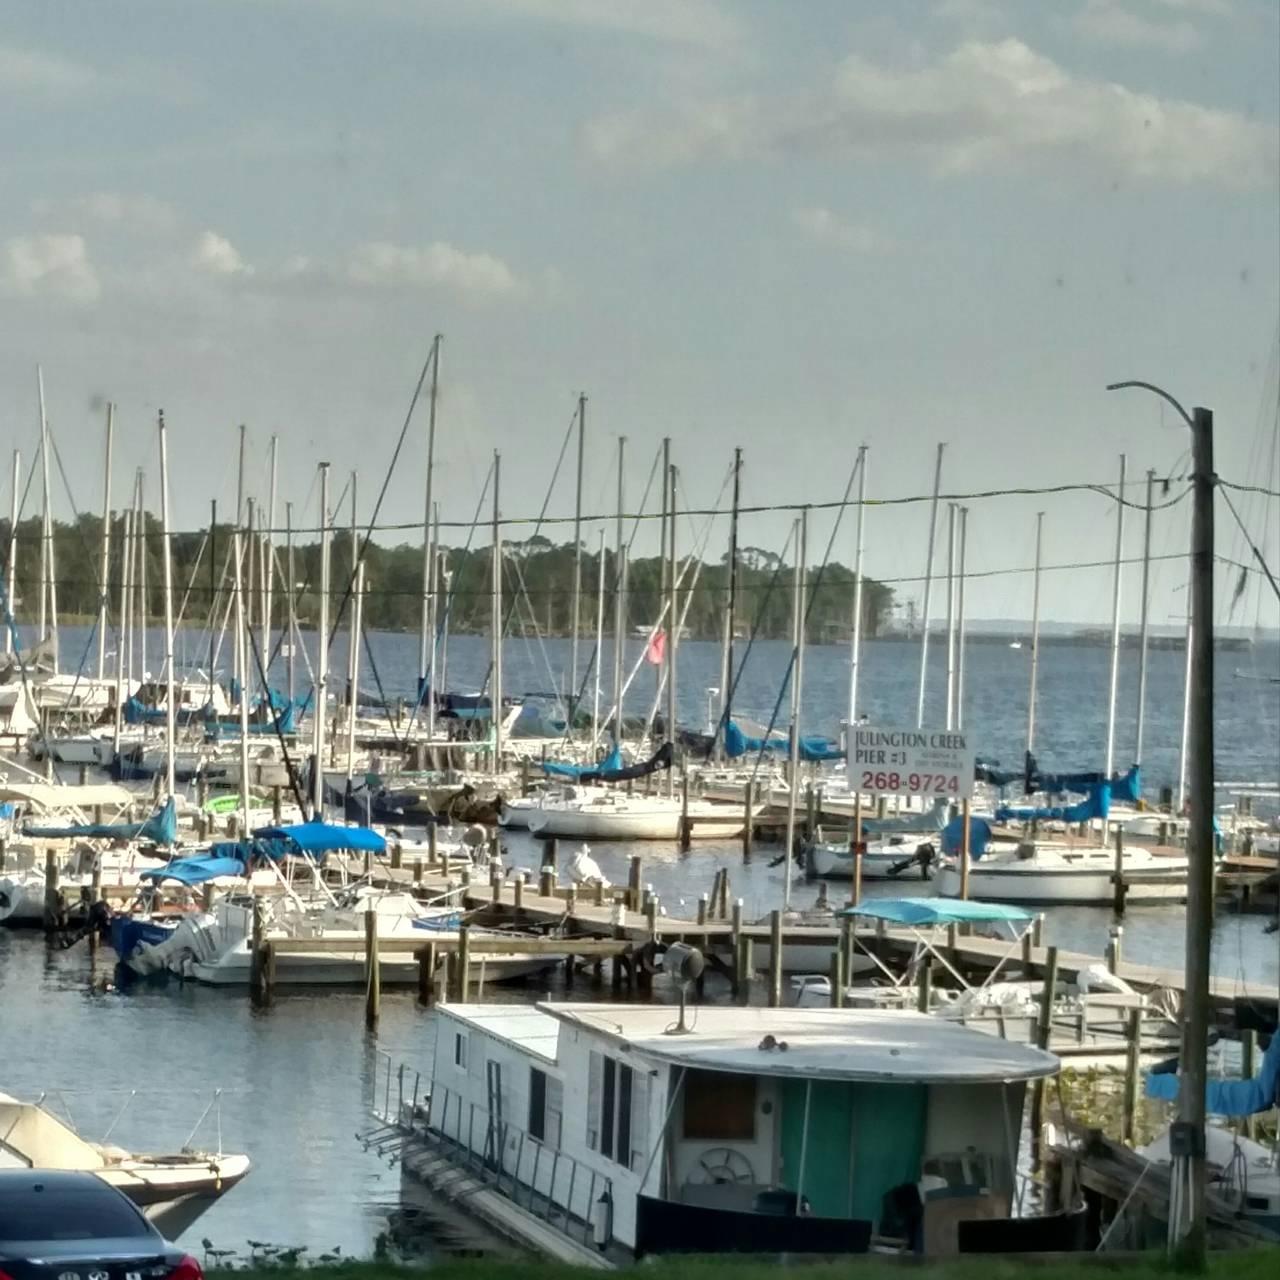 Julington Creek Fish Camp Restaurant - Jacksonville, FL | OpenTable